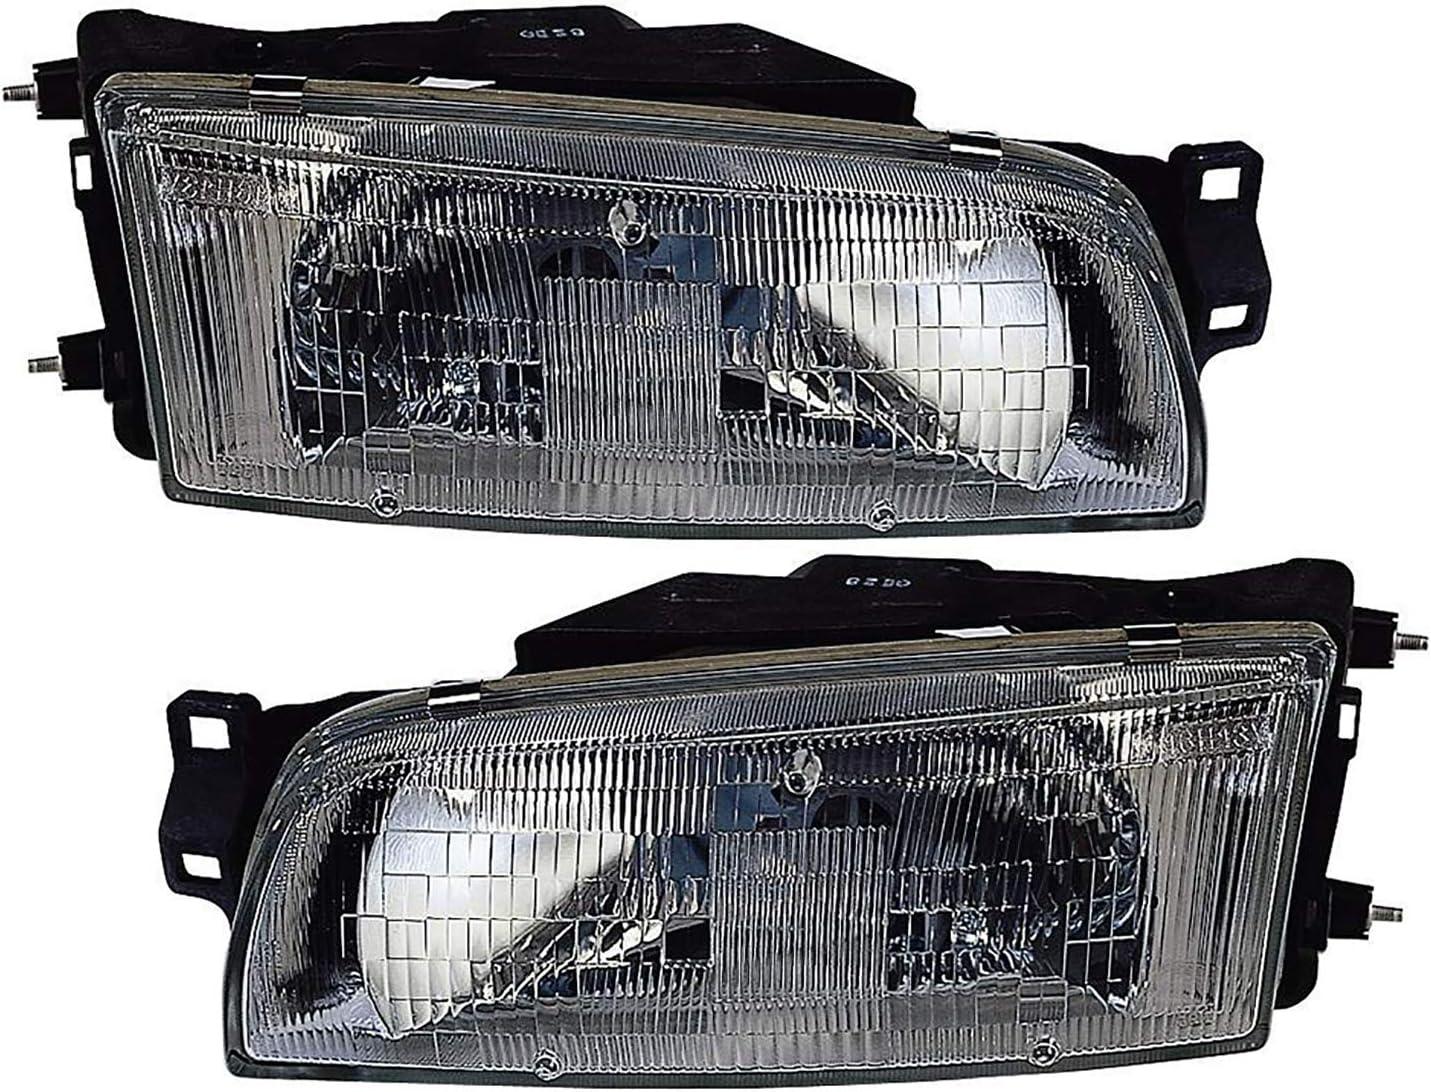 JP Auto Headlight Compatible With 1 Mirage Mitsubishi 1993 Max 66% Excellence OFF Sedan